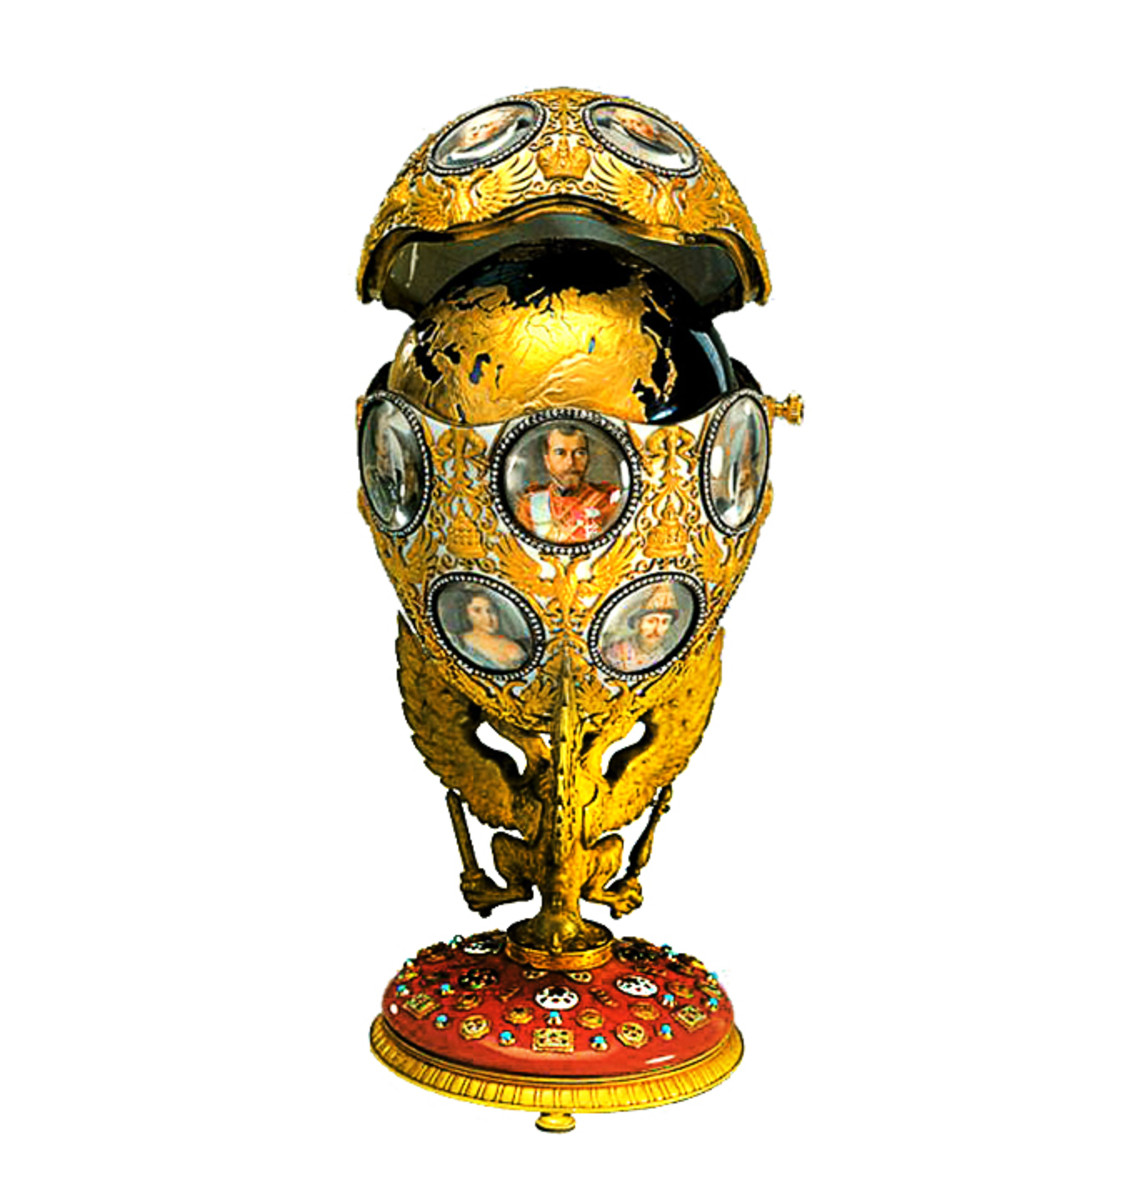 Romanov Tercentenary Egg - 1913